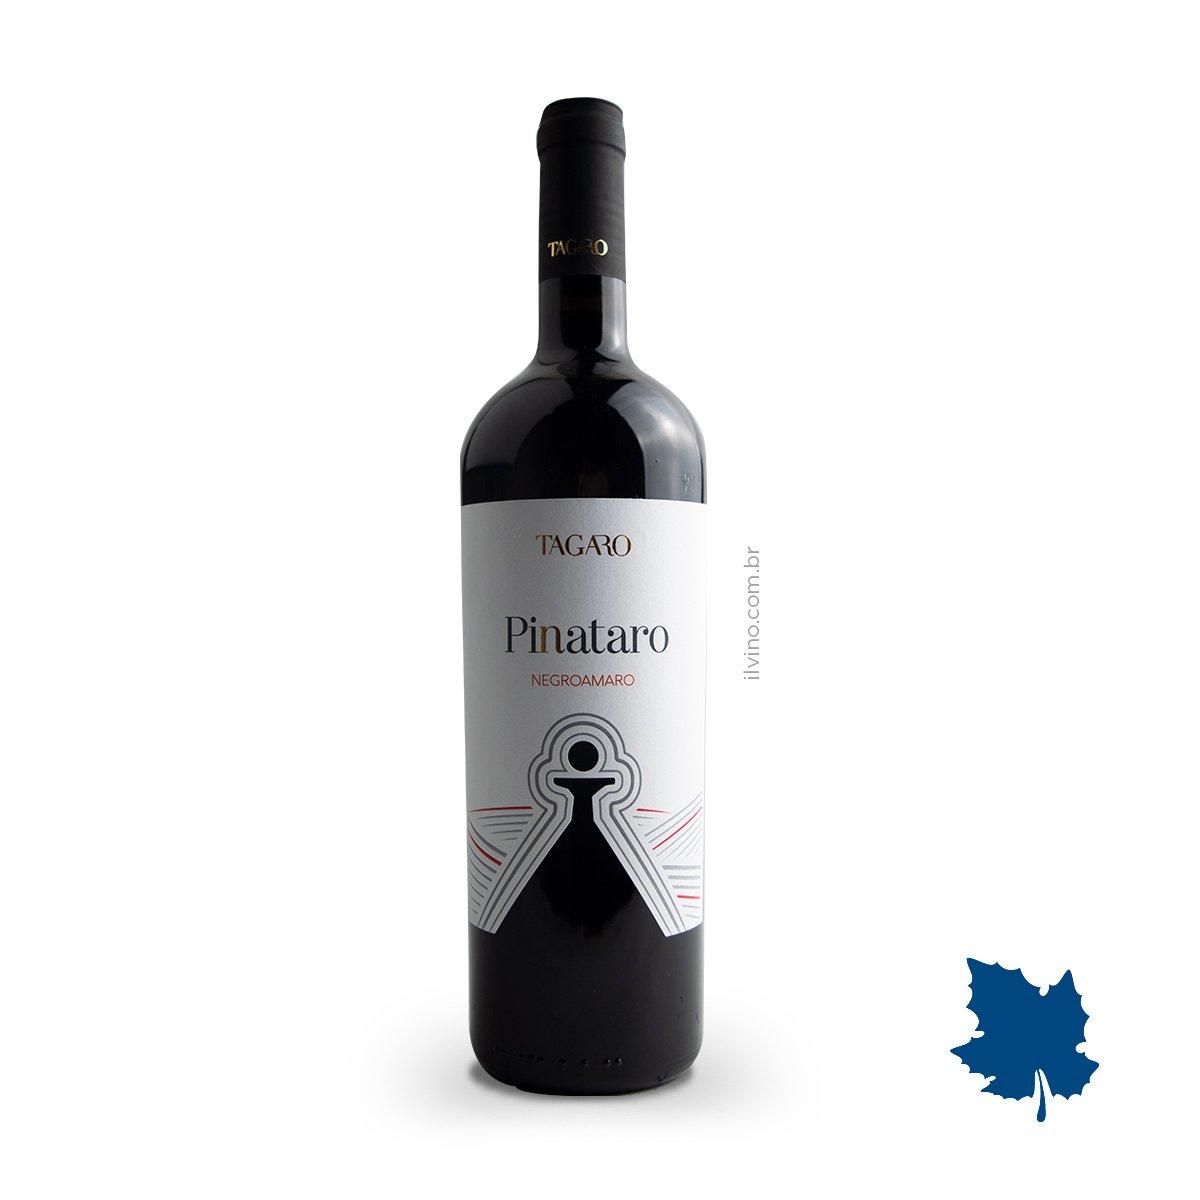 Vinho Italiano Tagaro Pinataro Negroamaro IGT 2017 750ml